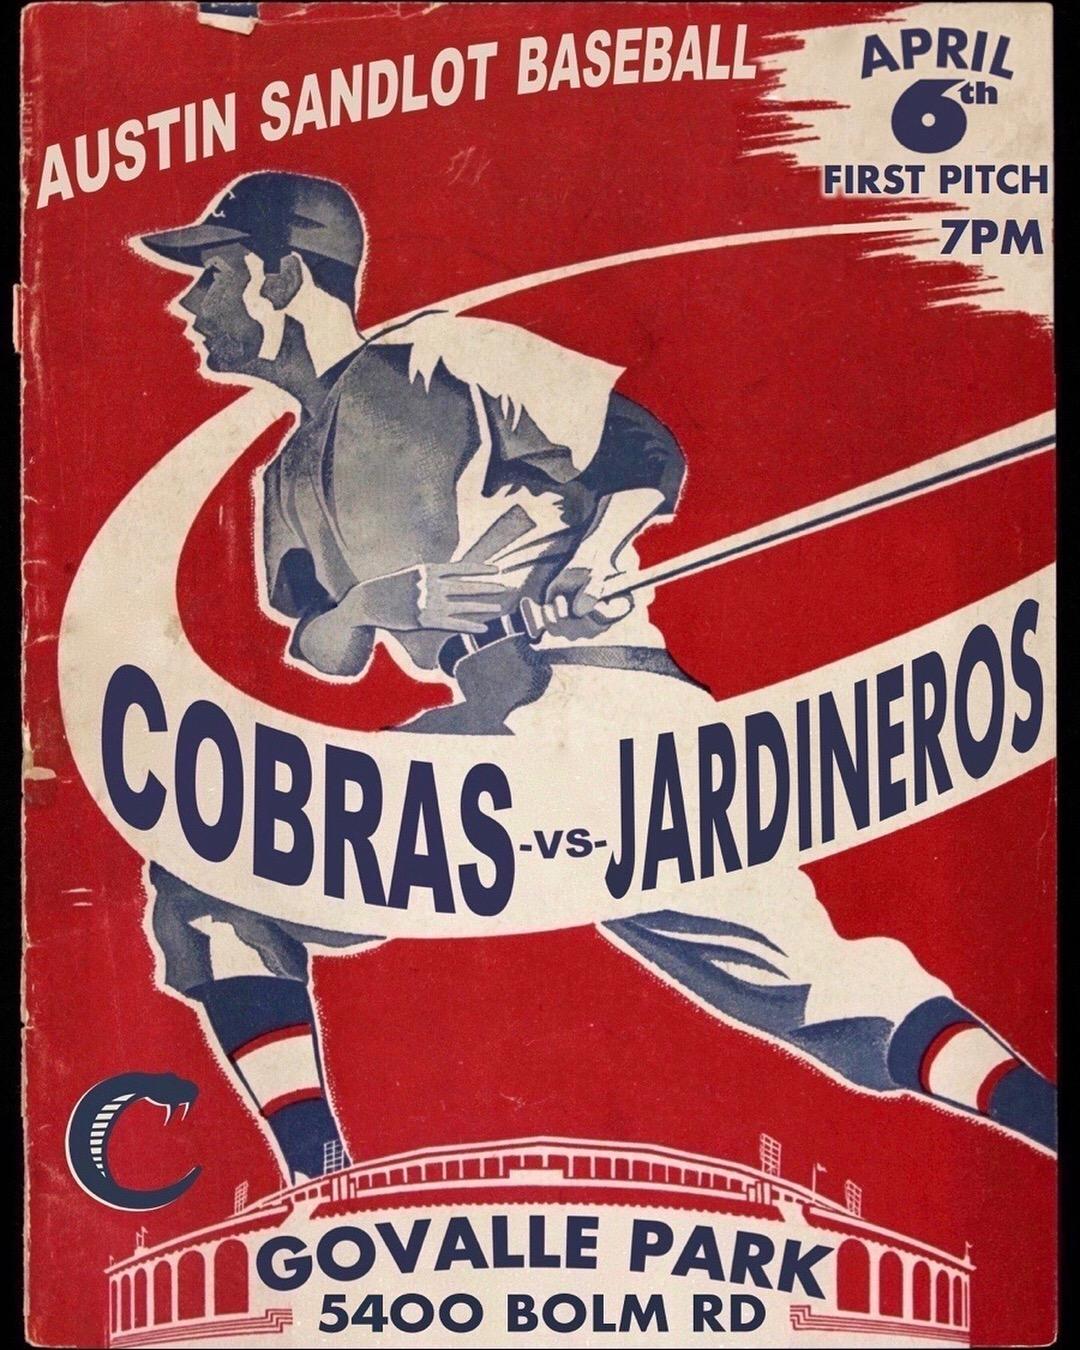 April 6 2018 Cobras Poster.JPG